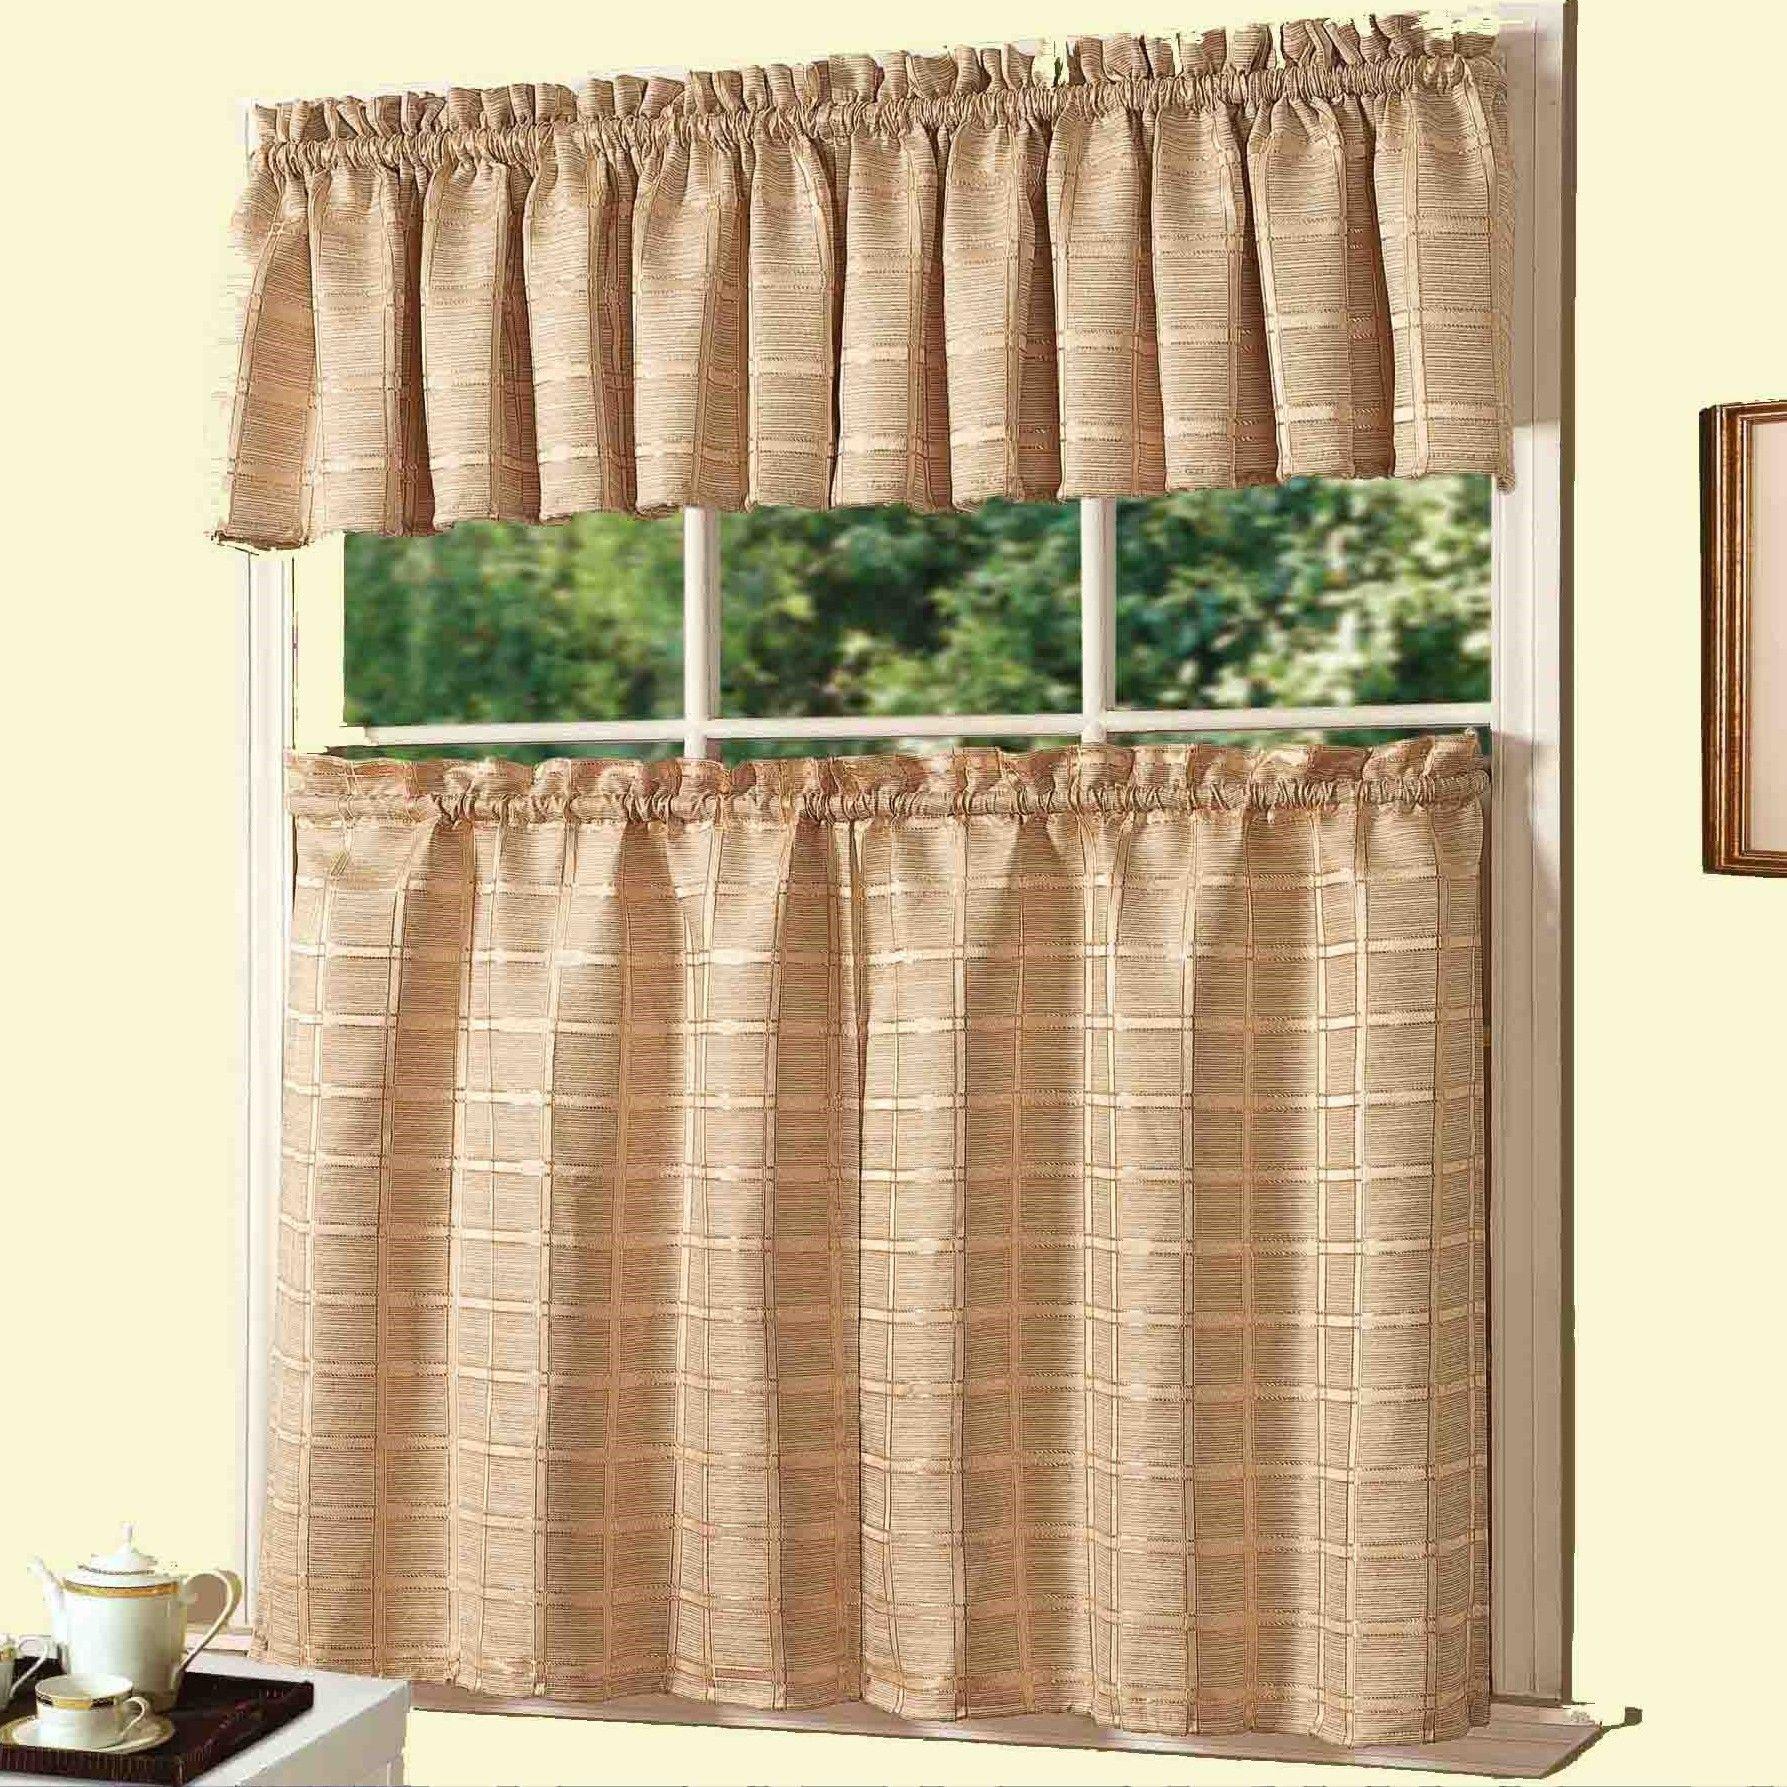 Jeanette 3 Piece Kitchen Curtain Set Kitchen Curtain Sets